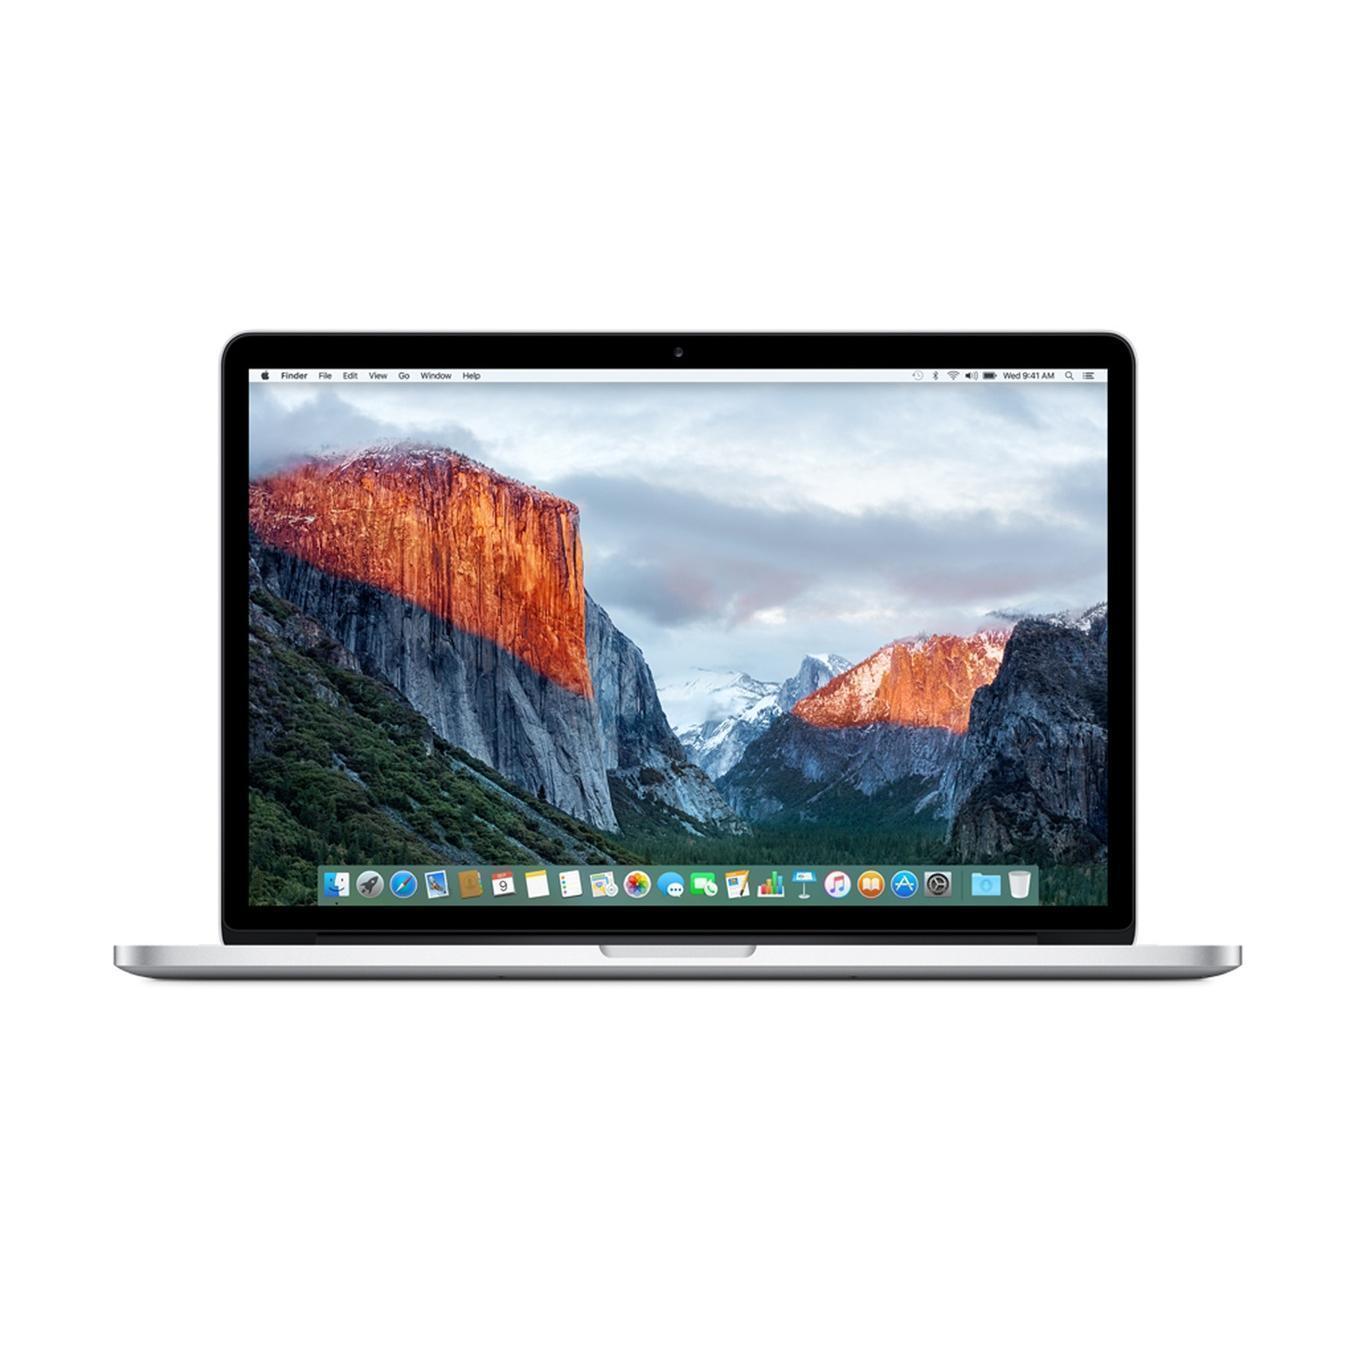 MacBook Pro Retina 15.4-inch (2015) - Core i7 - 16GB - SSD 500 GB QWERTY - Italian